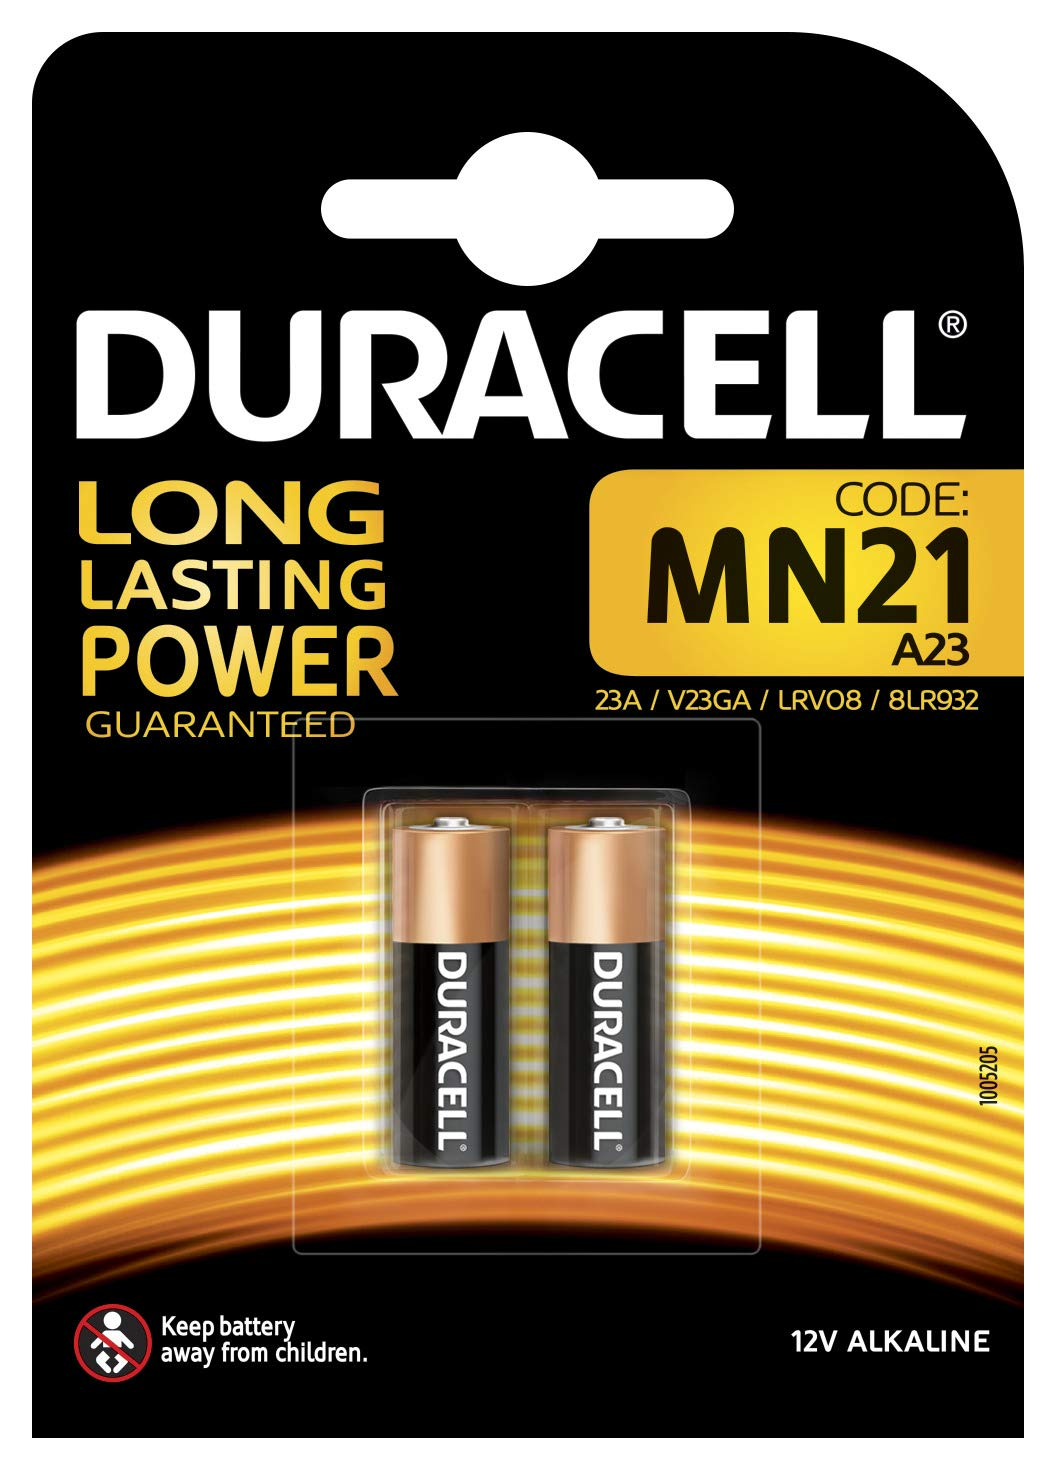 Duracell Security - Kit de 2 pilas (12 V, 1.5 W) product image